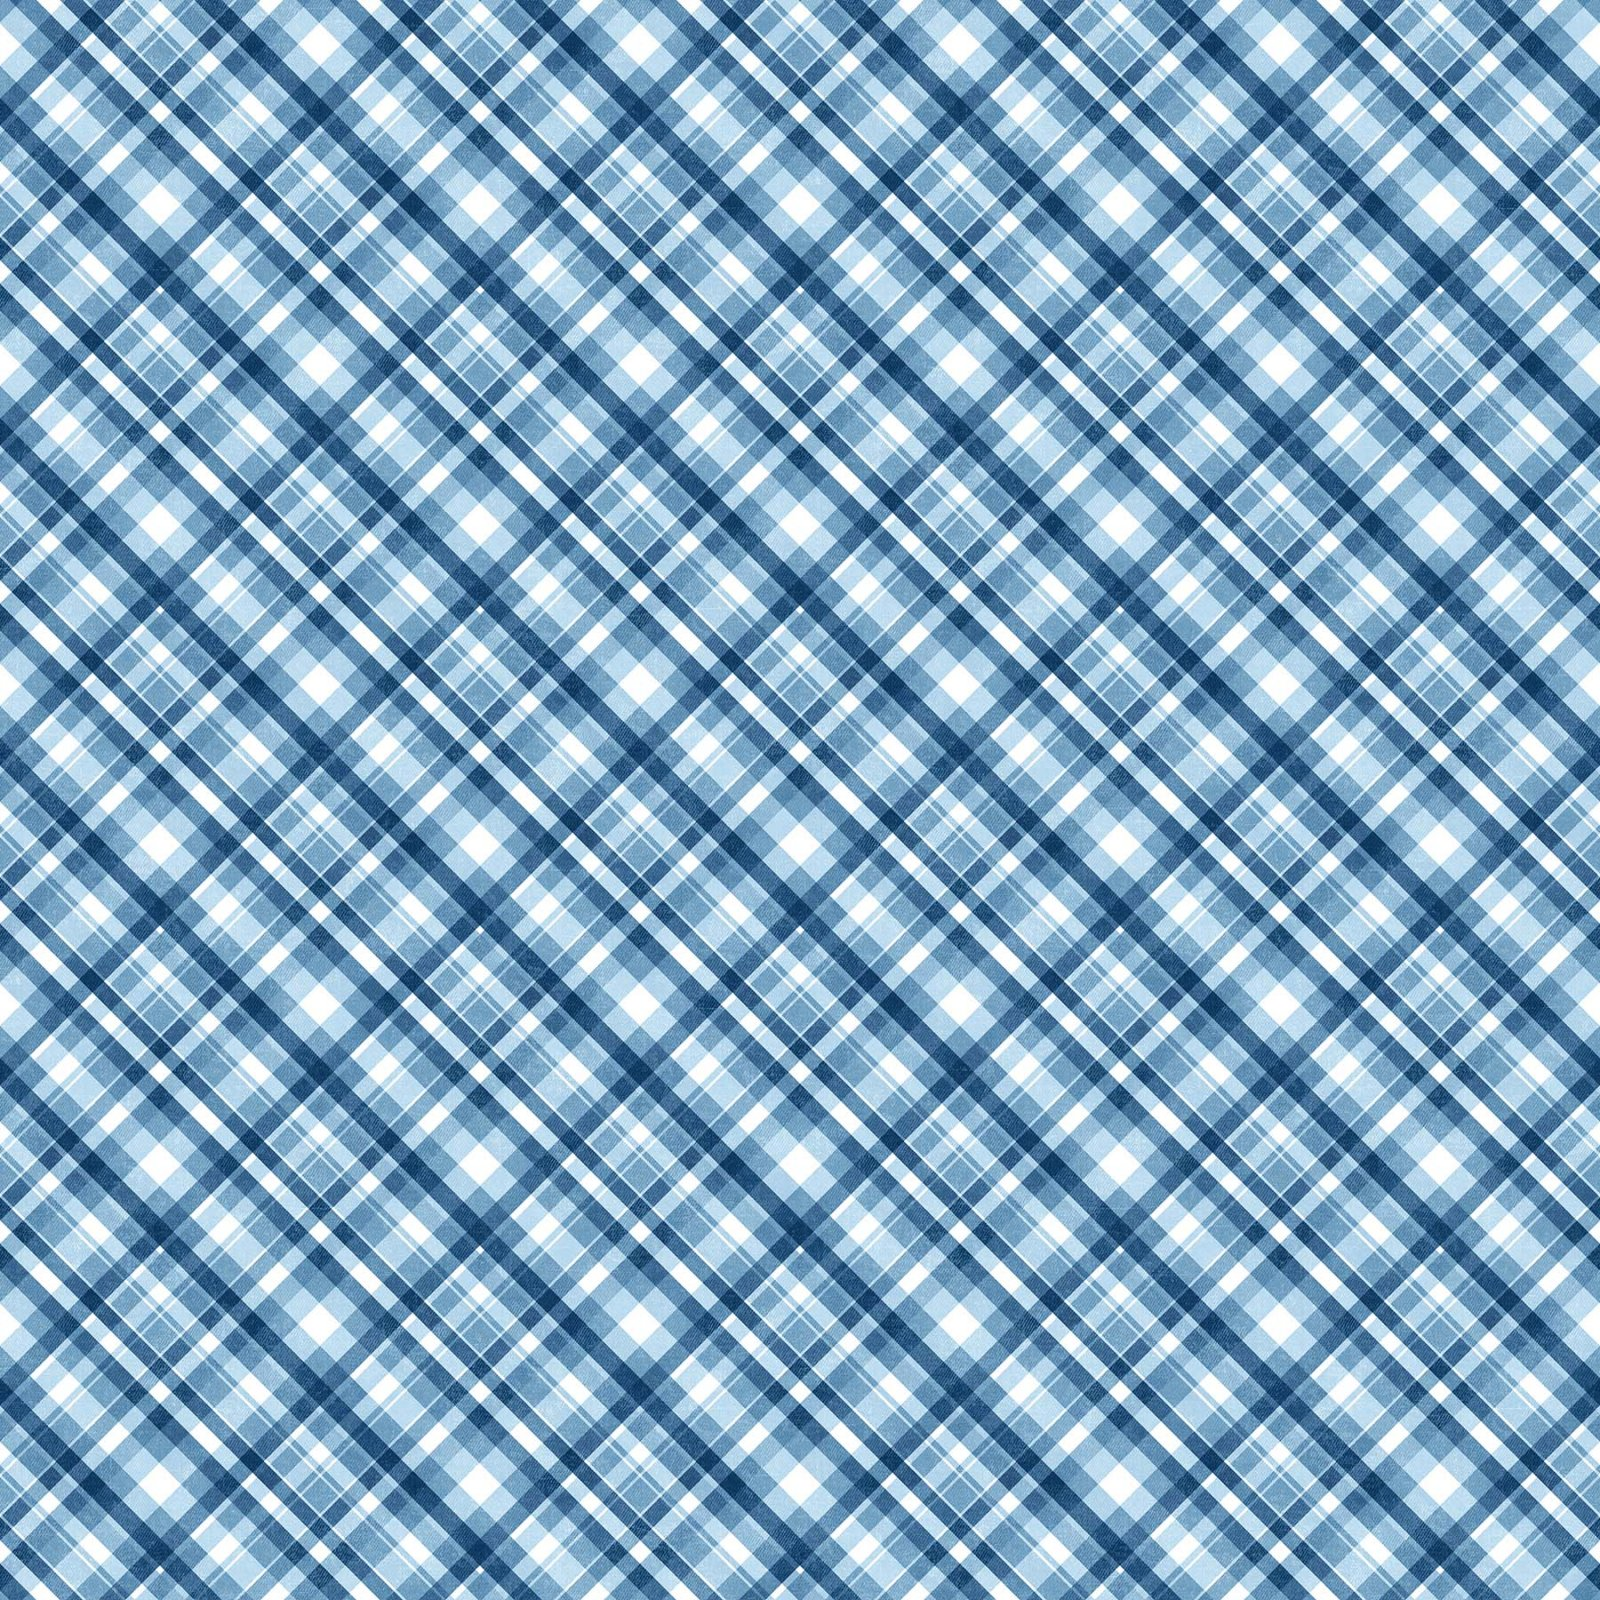 GOT THE BLUES DIAGONAL CHECK MID BLUE 23380-44